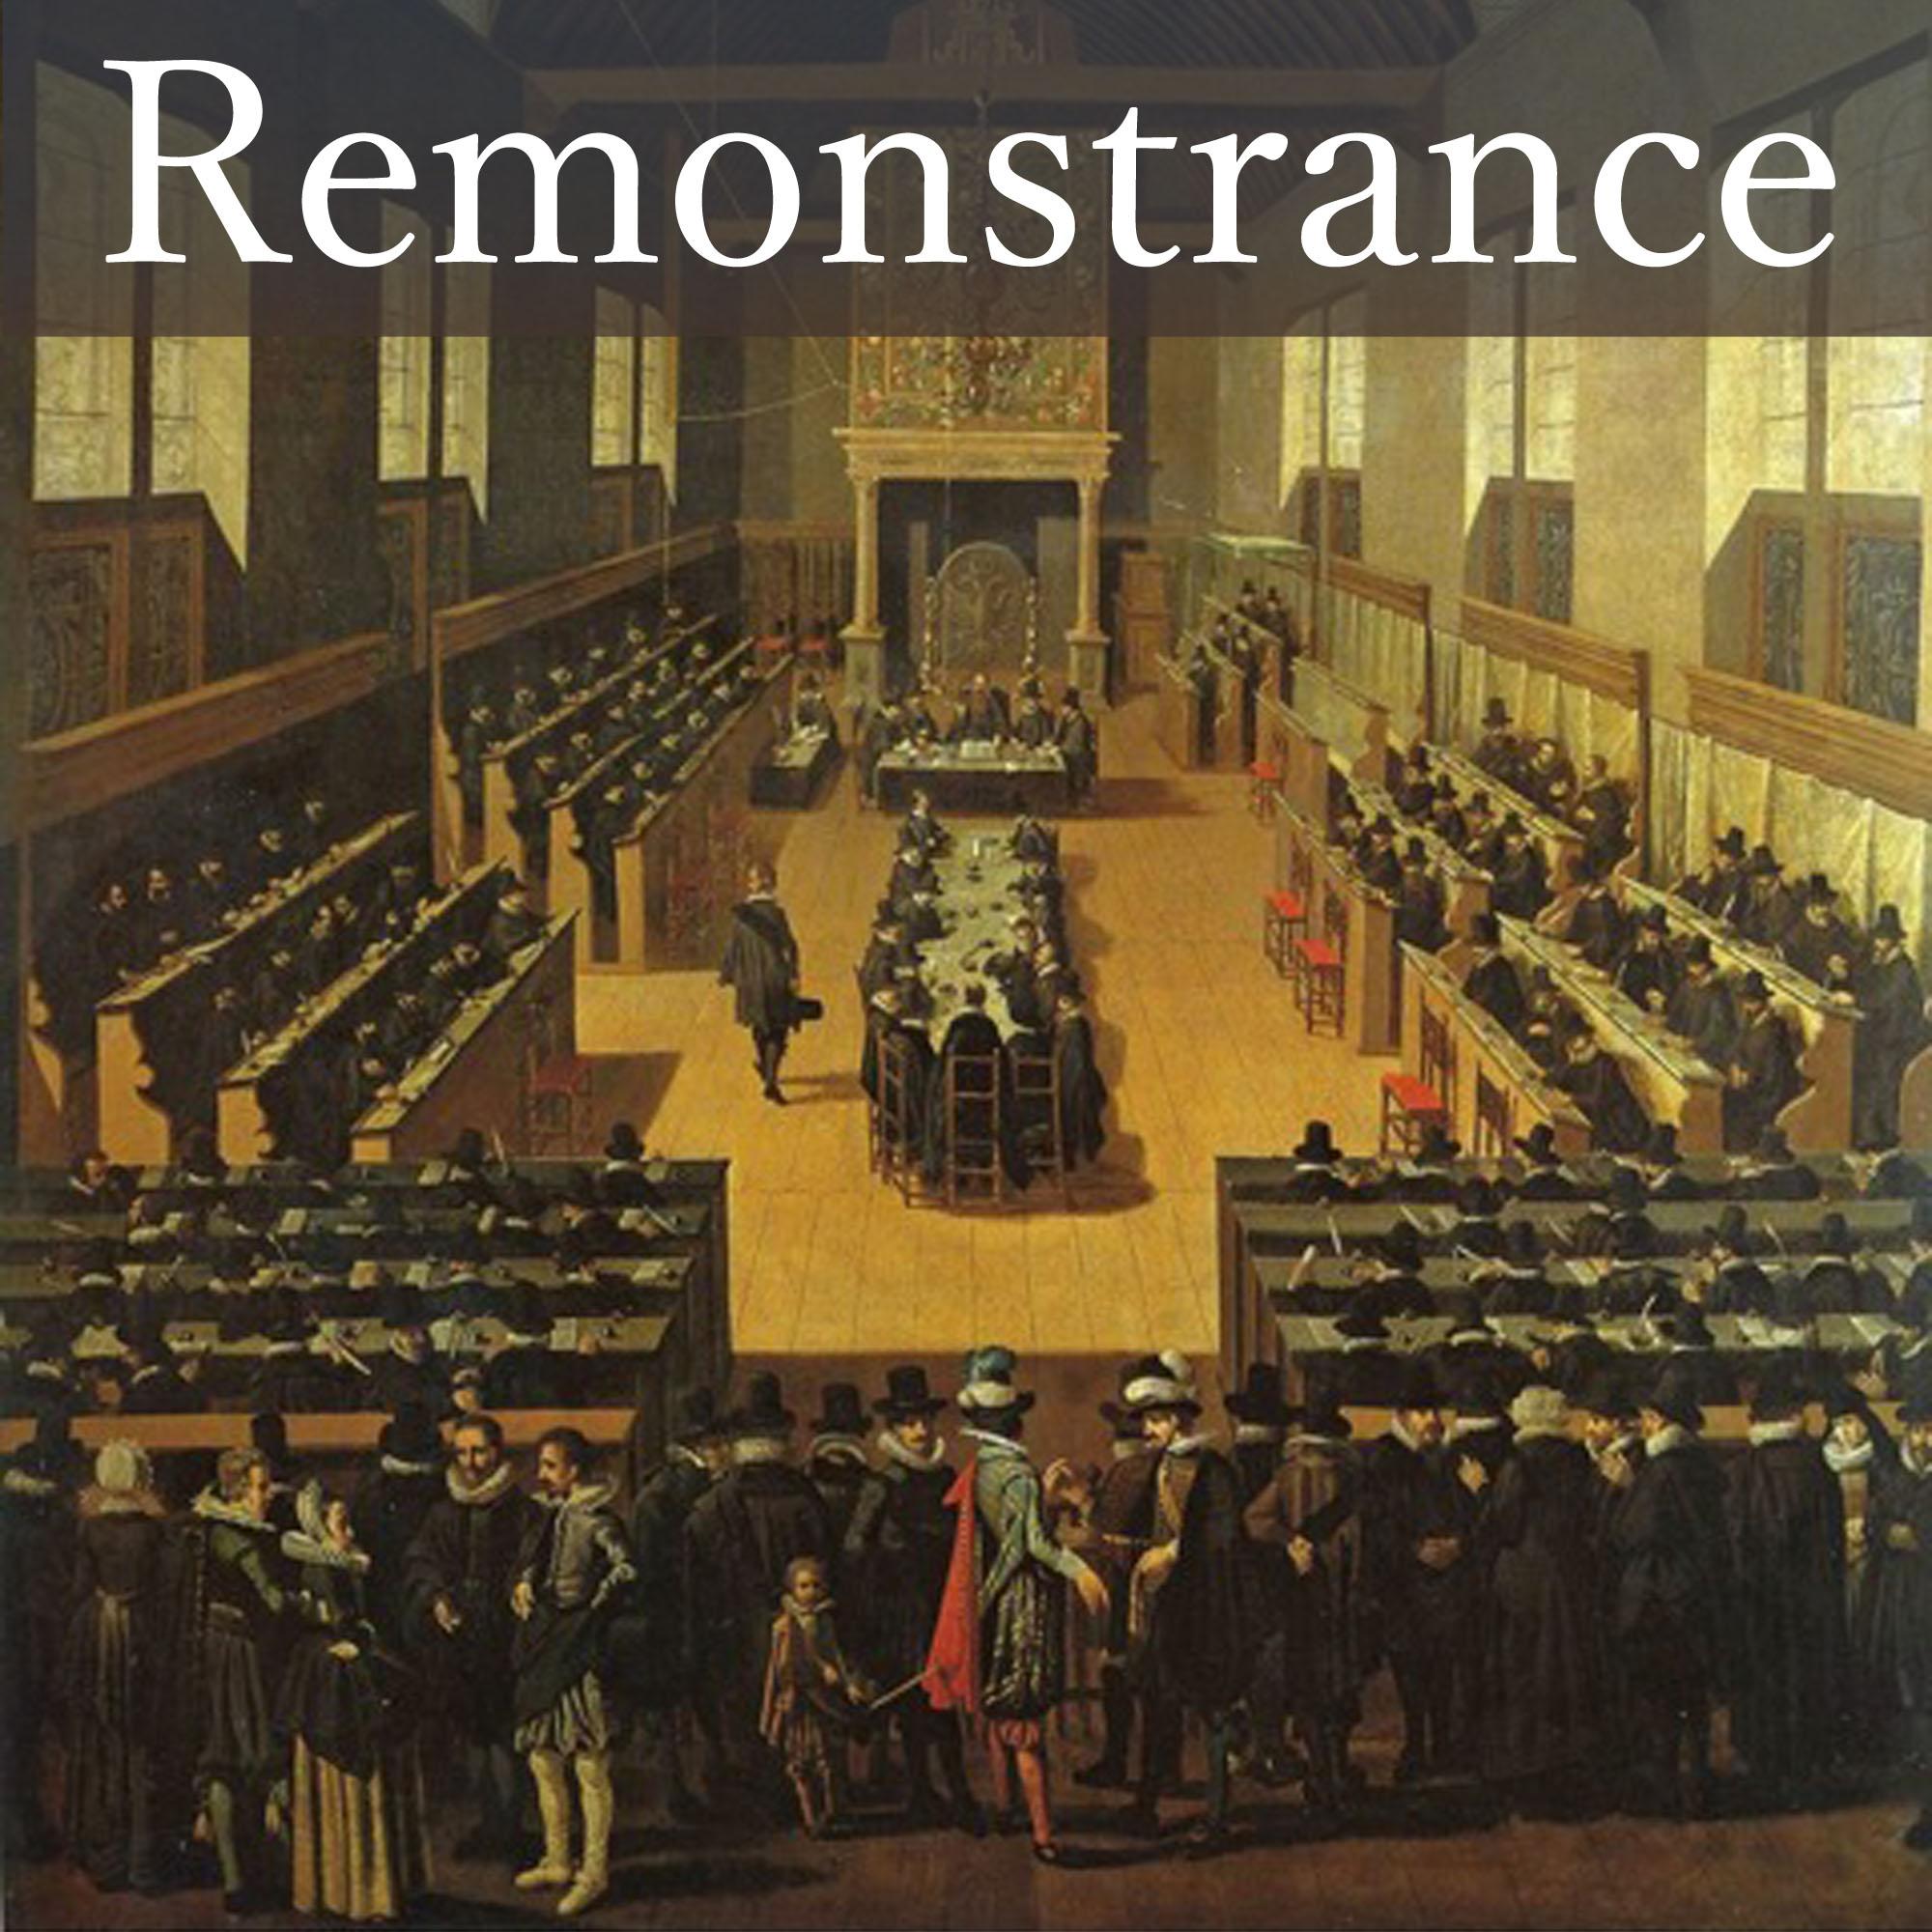 remonstrance